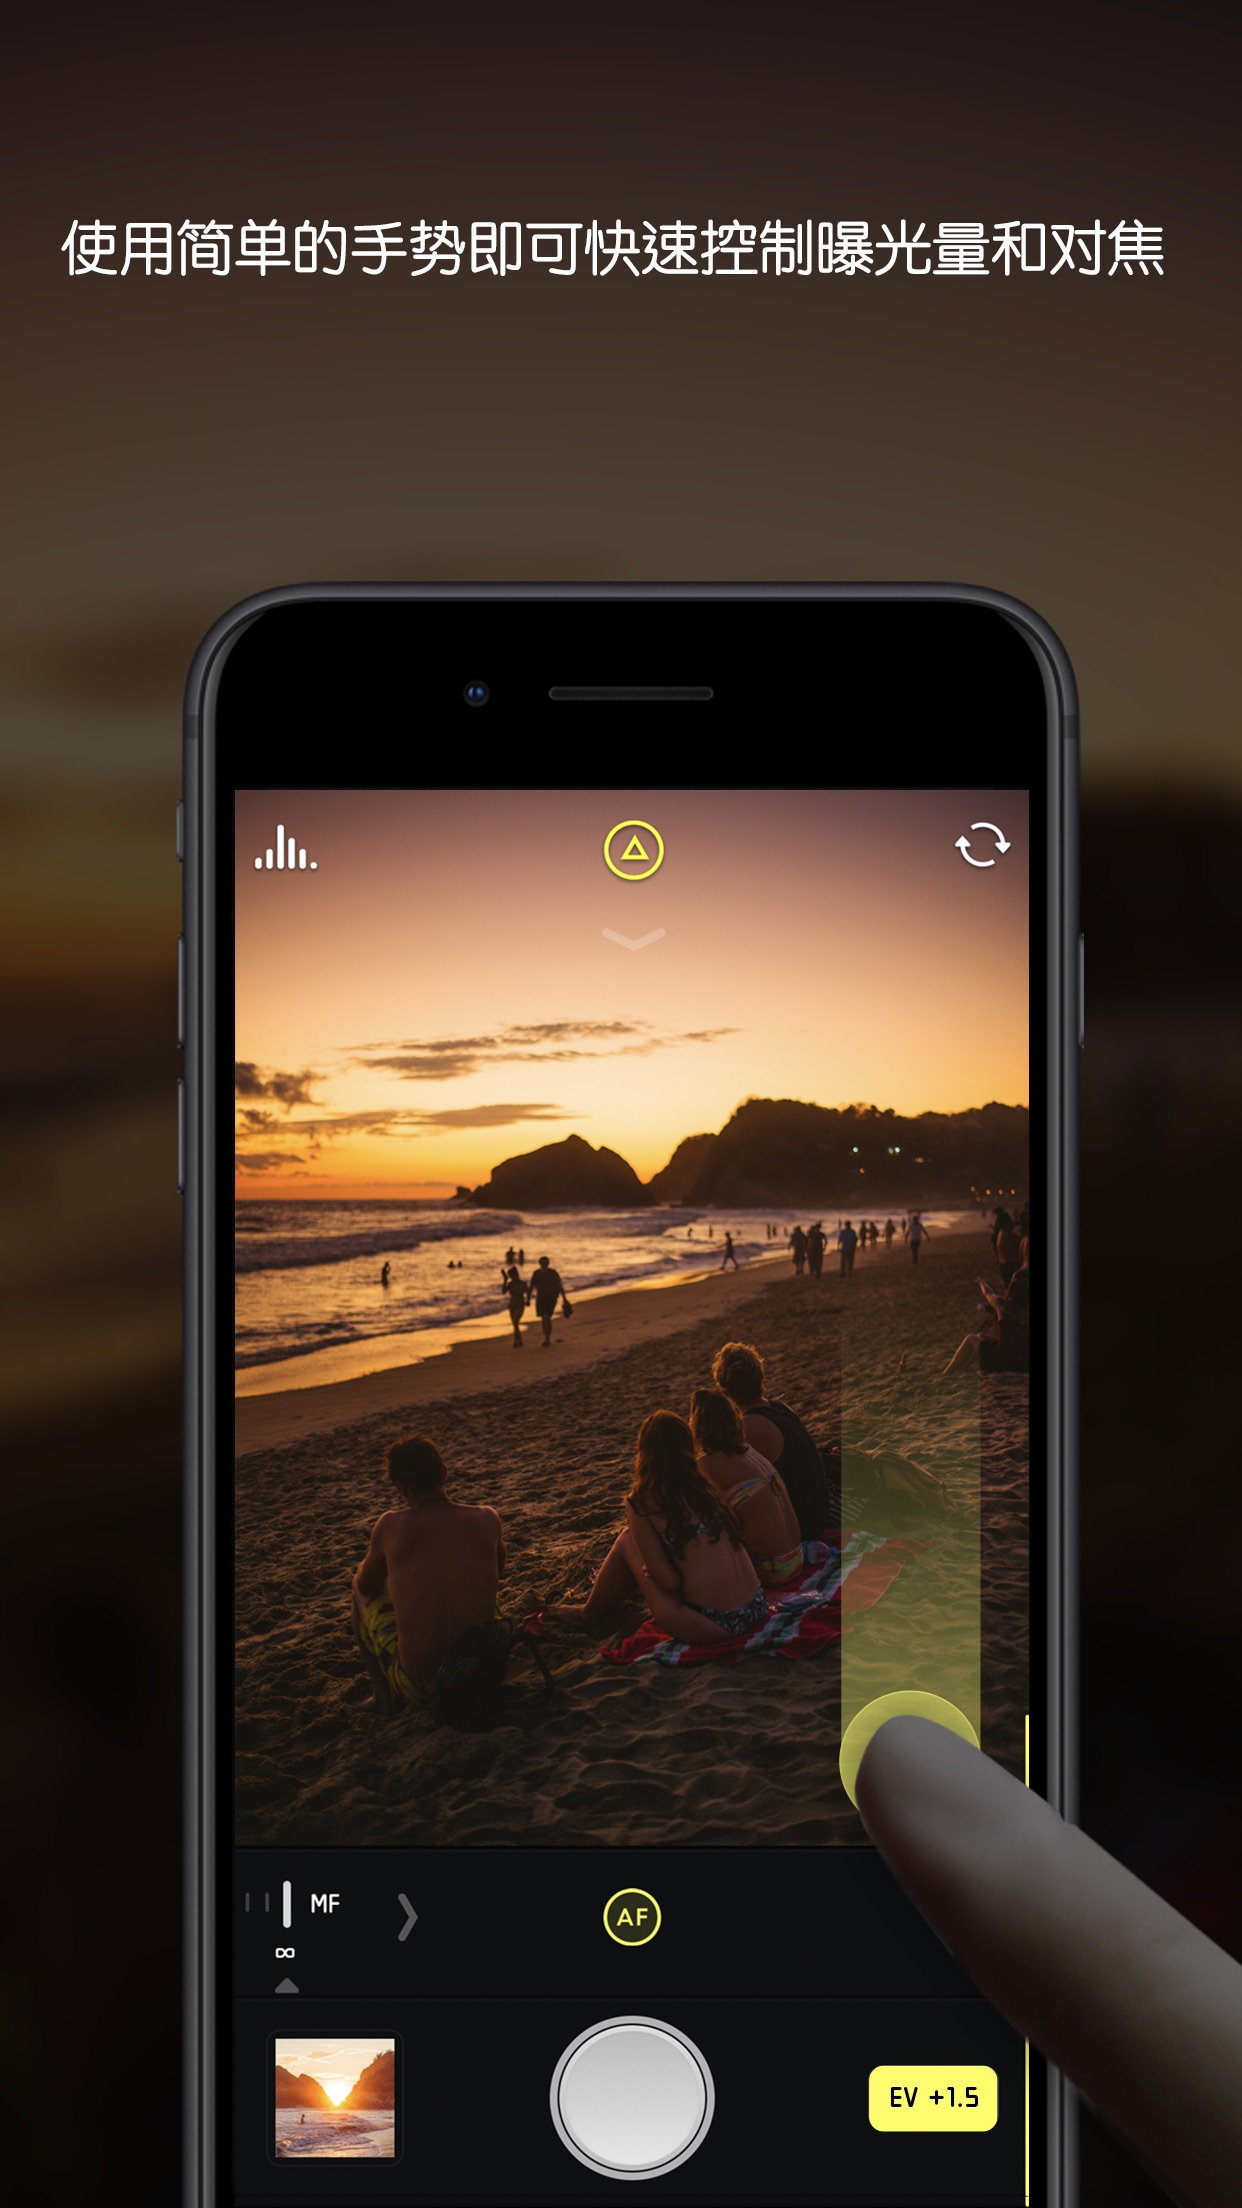 Halide - RAW手动相机 Screenshot